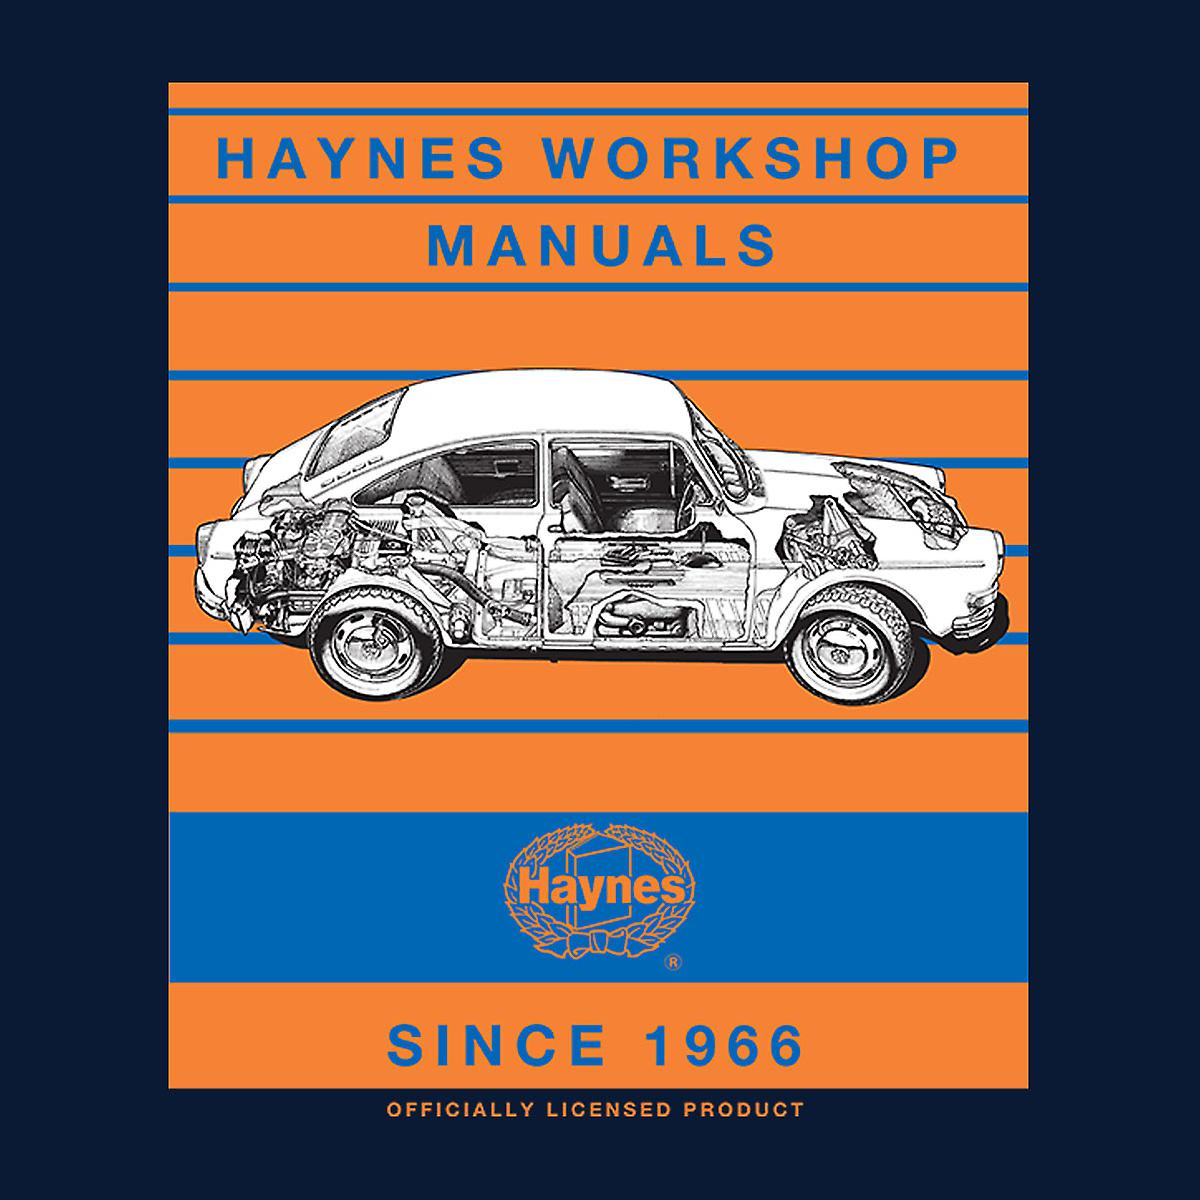 Vw 1600 Max Rpm: Haynes Workshop Manual 0084 VW 1600 Fastback Stripe Herren